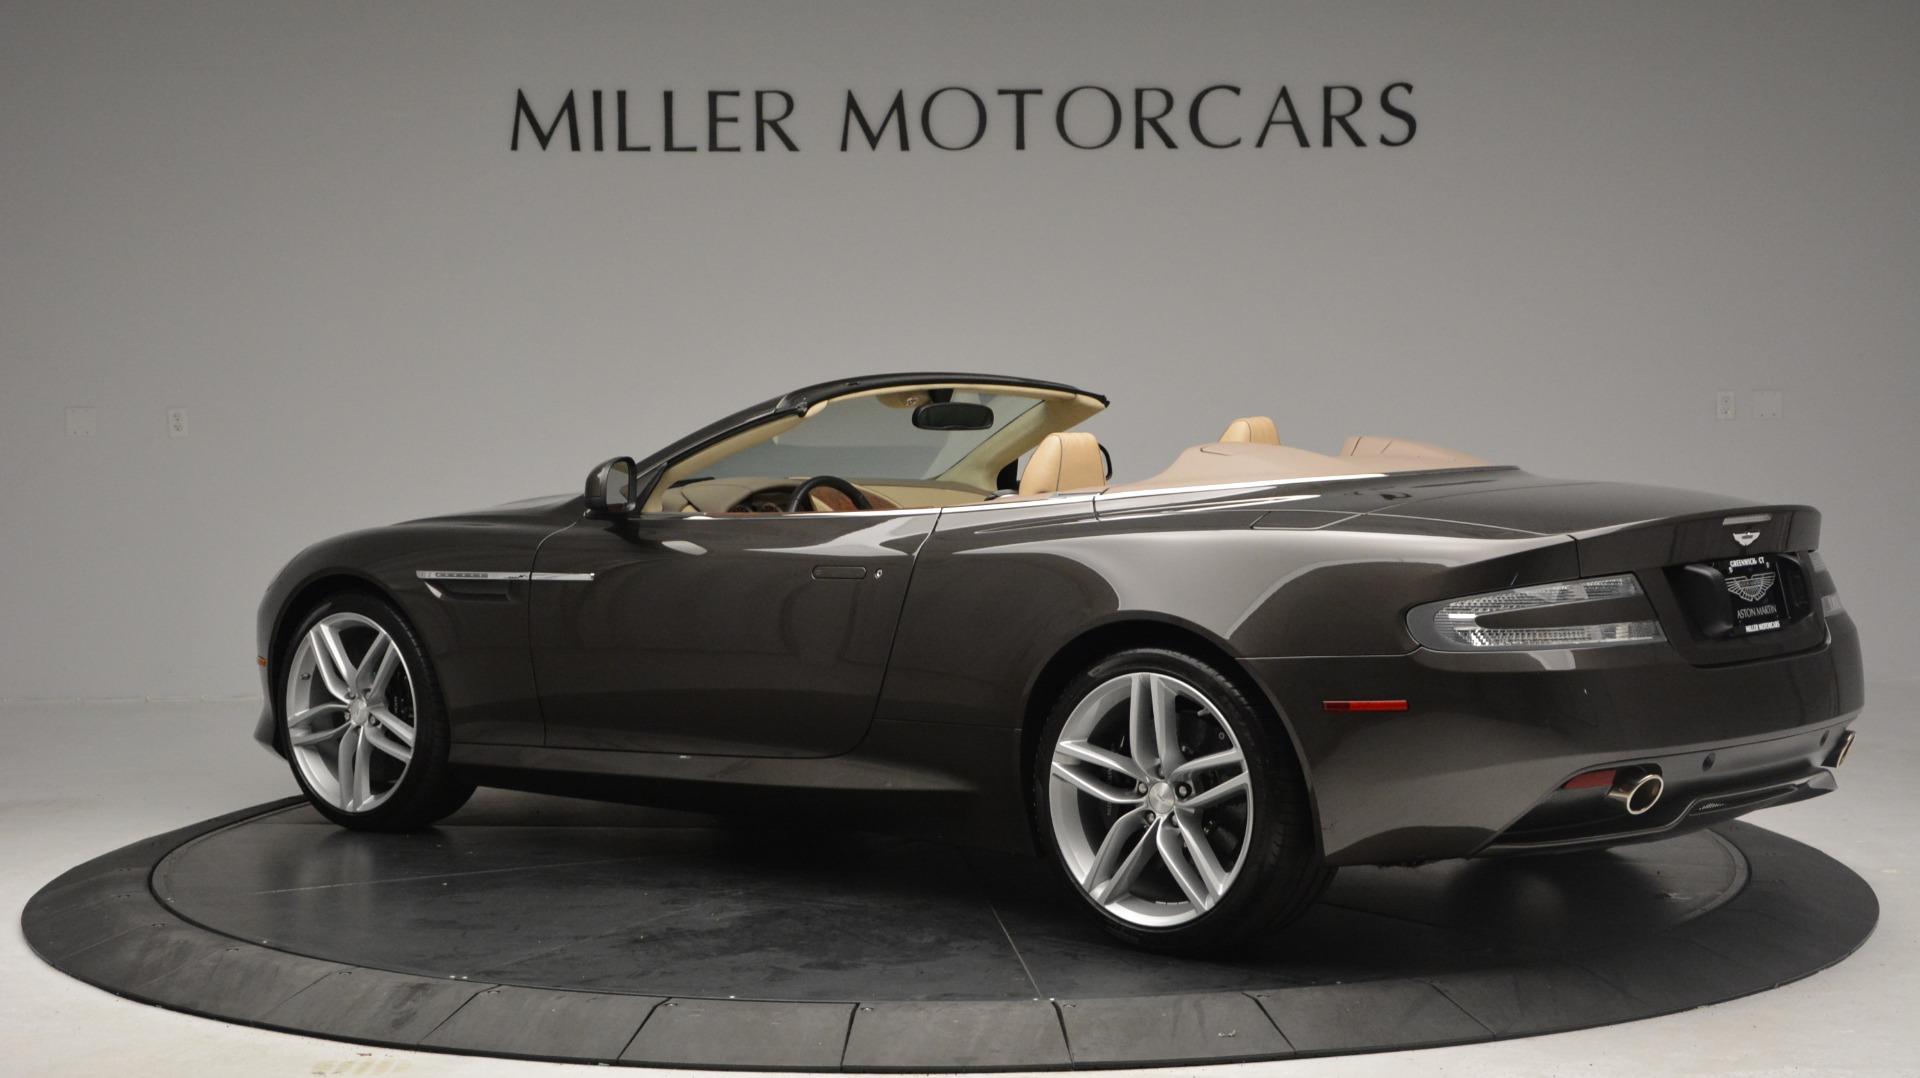 Used 2012 Aston Martin Virage Convertible For Sale In Greenwich, CT. Alfa Romeo of Greenwich, 7613 3351_p4